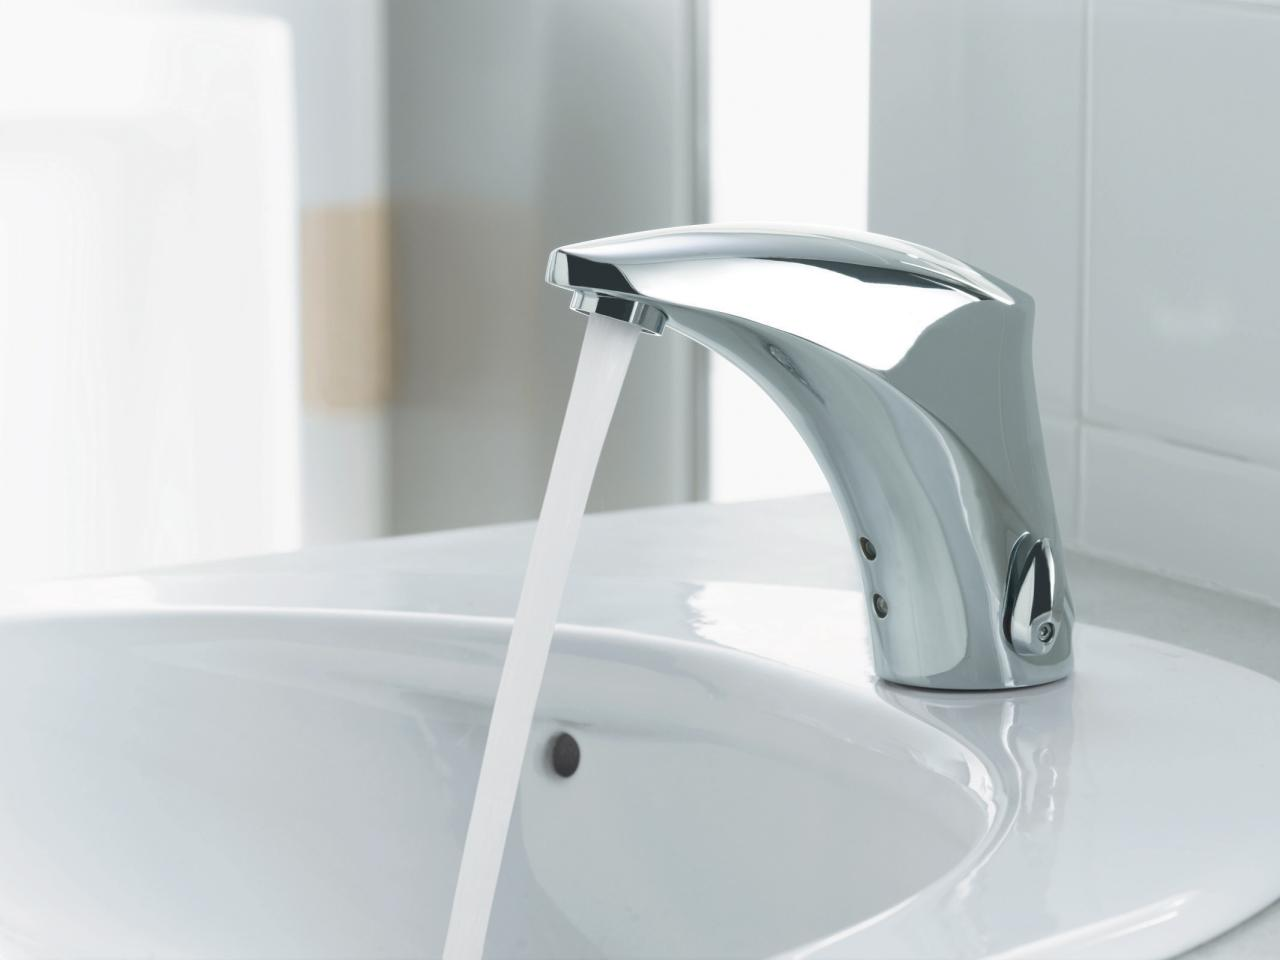 spa bathroom fixtures photo - 8